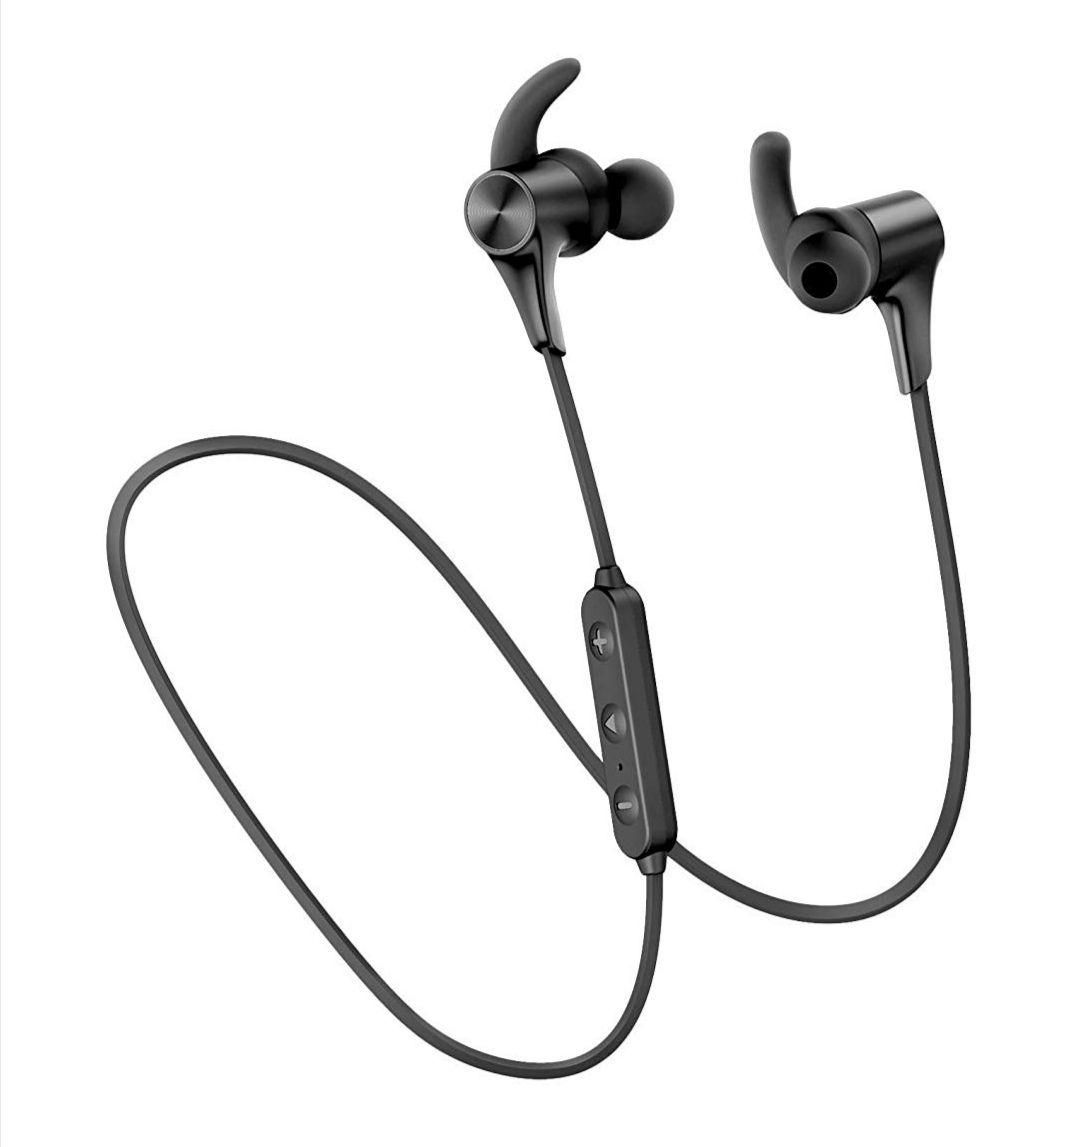 SoundPEATS Q12 HD, Bluetooth 5.0 IPX6 Sweatproof Wireless Headphones APTX High Definition Bluetooth £19.99 + £4.49 NP @ TEKTEK EU FB Amazon